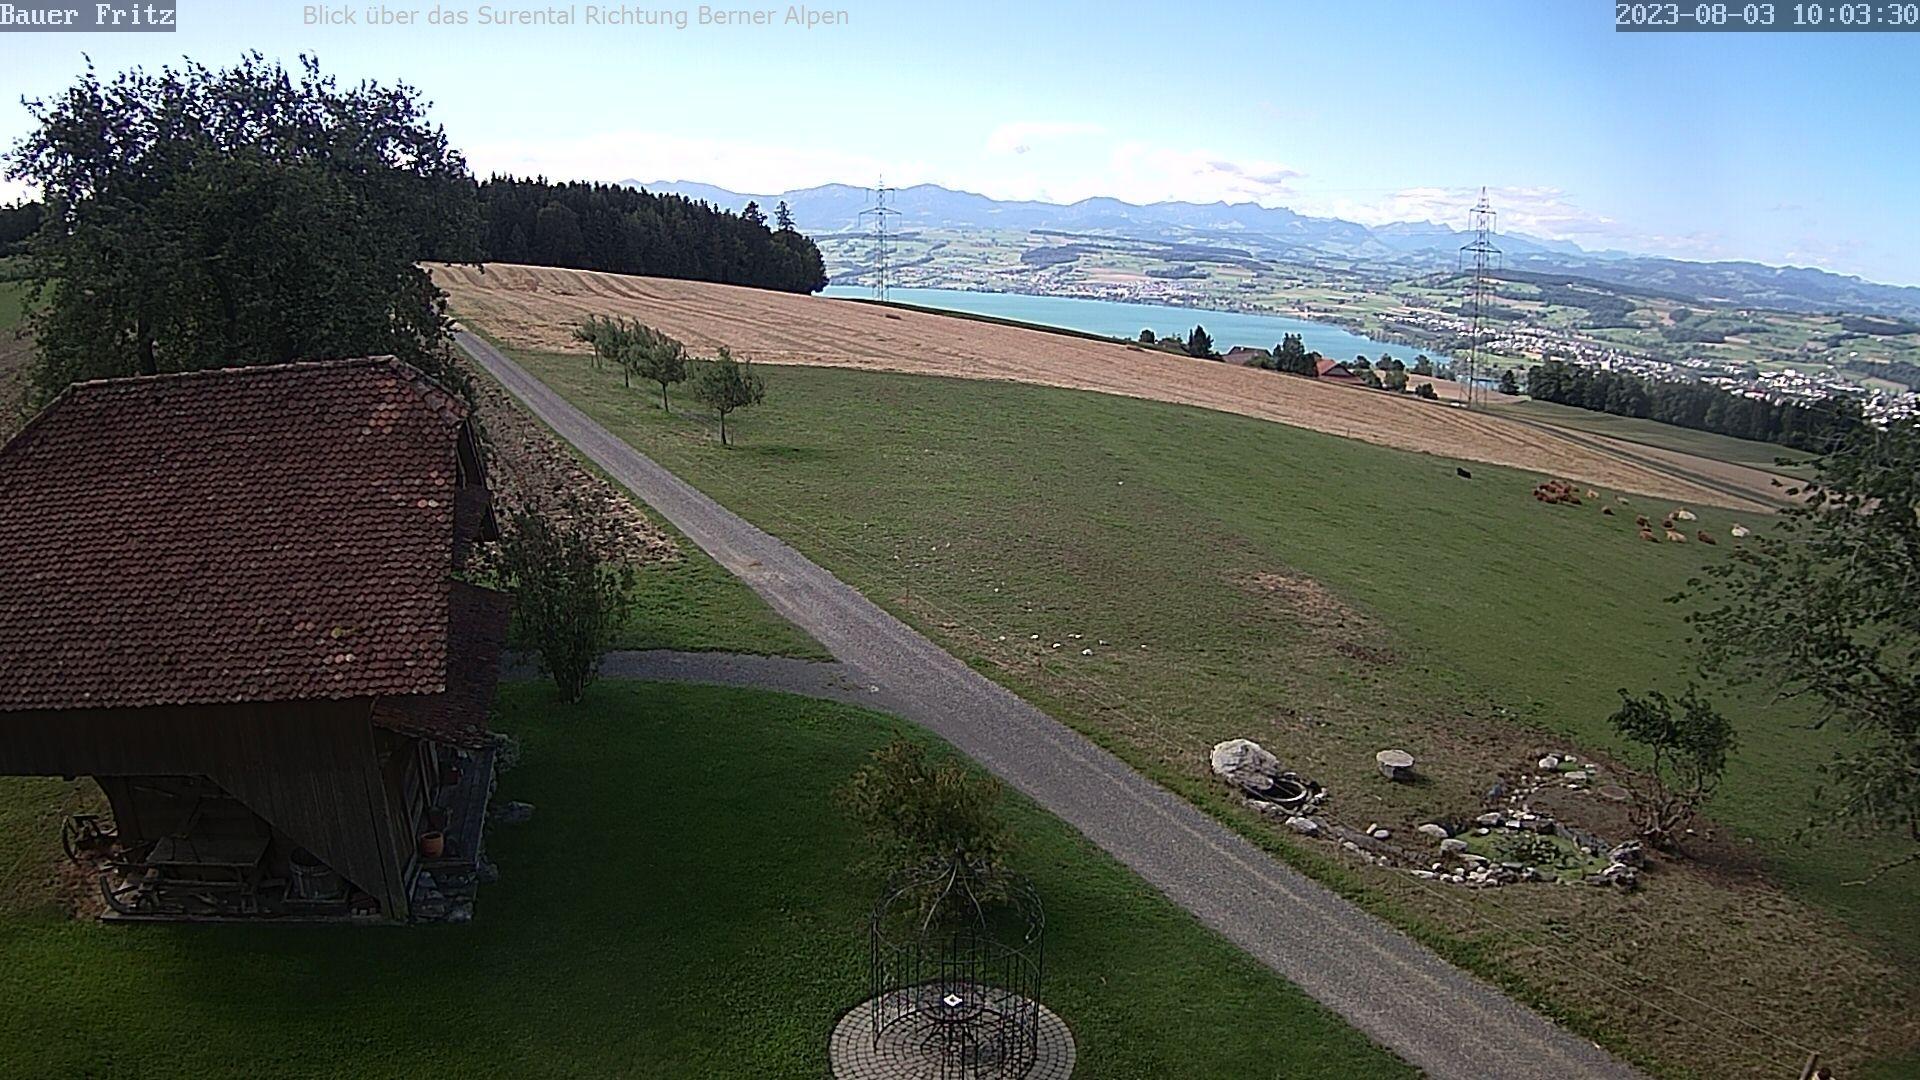 Wetter Rickenbach